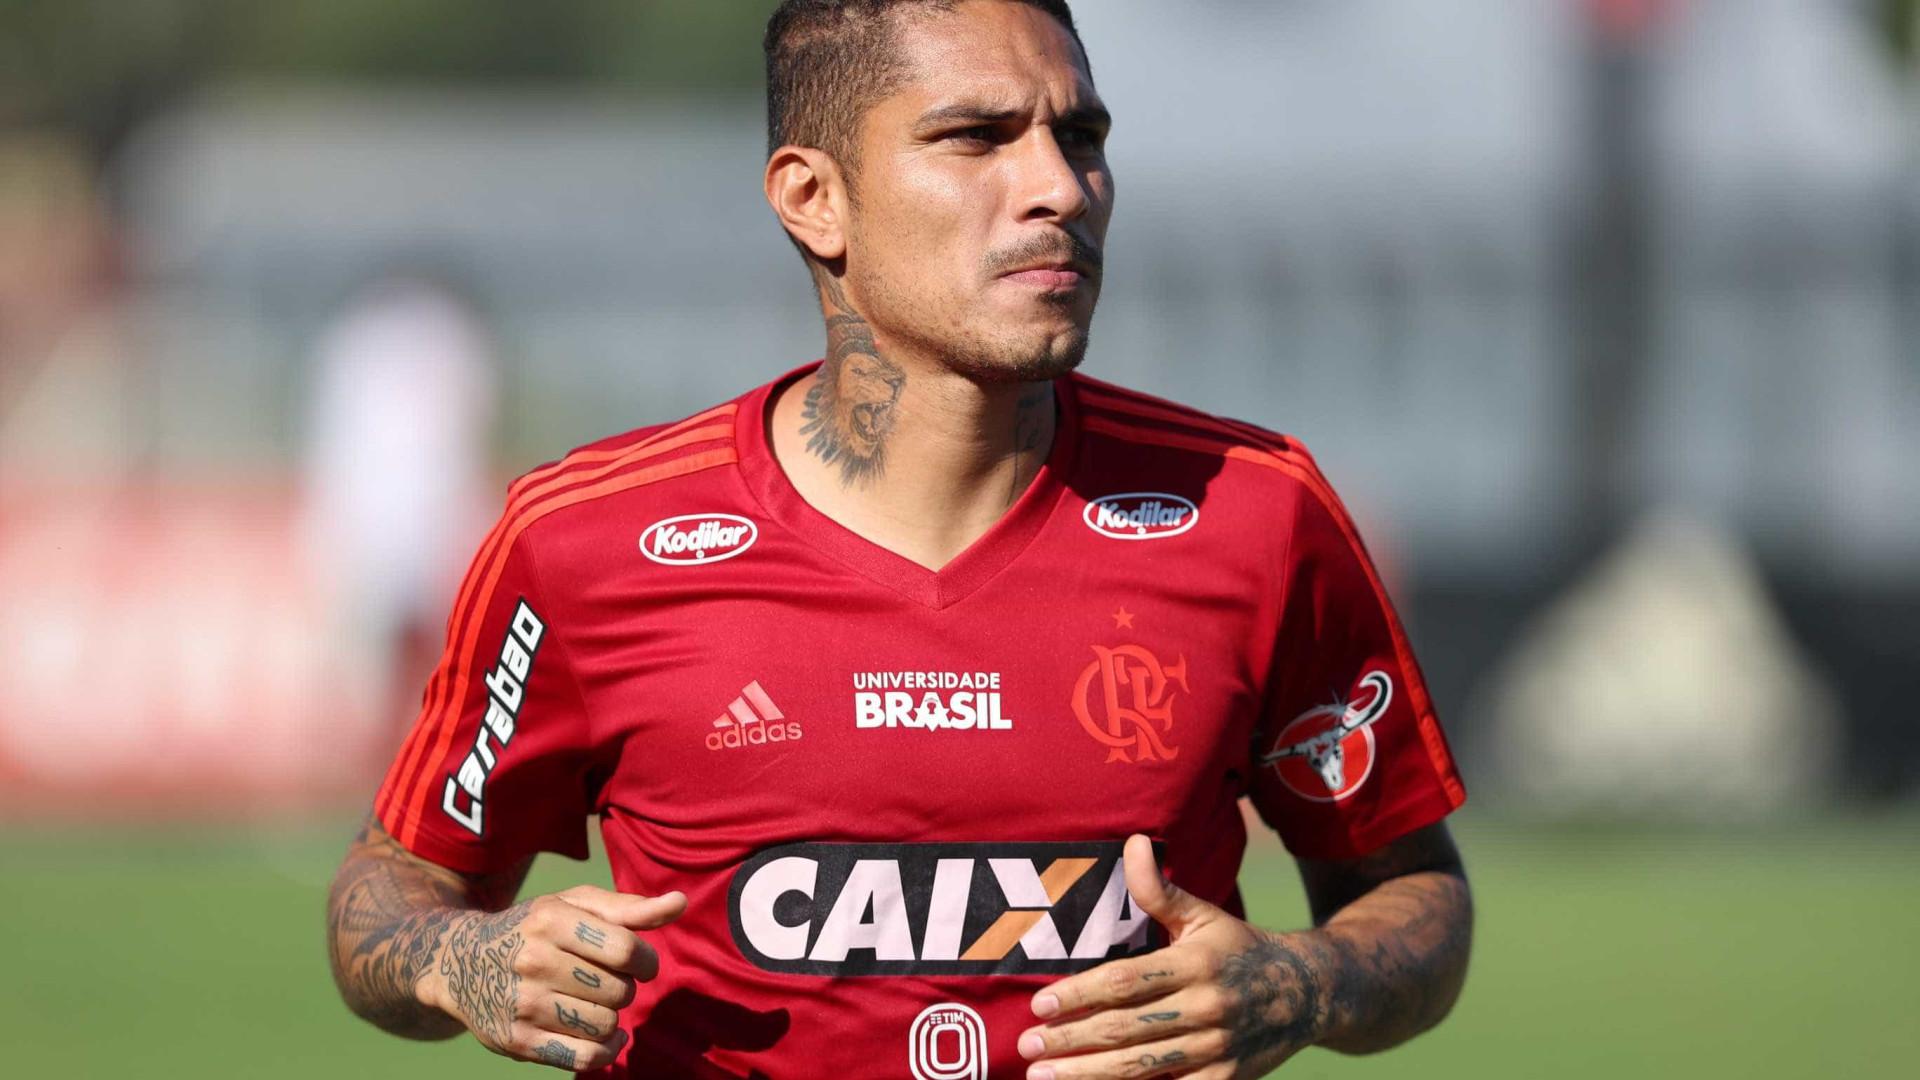 Lesionado, Guerrero é descartado pelo Fla para jogo contra o Grêmio